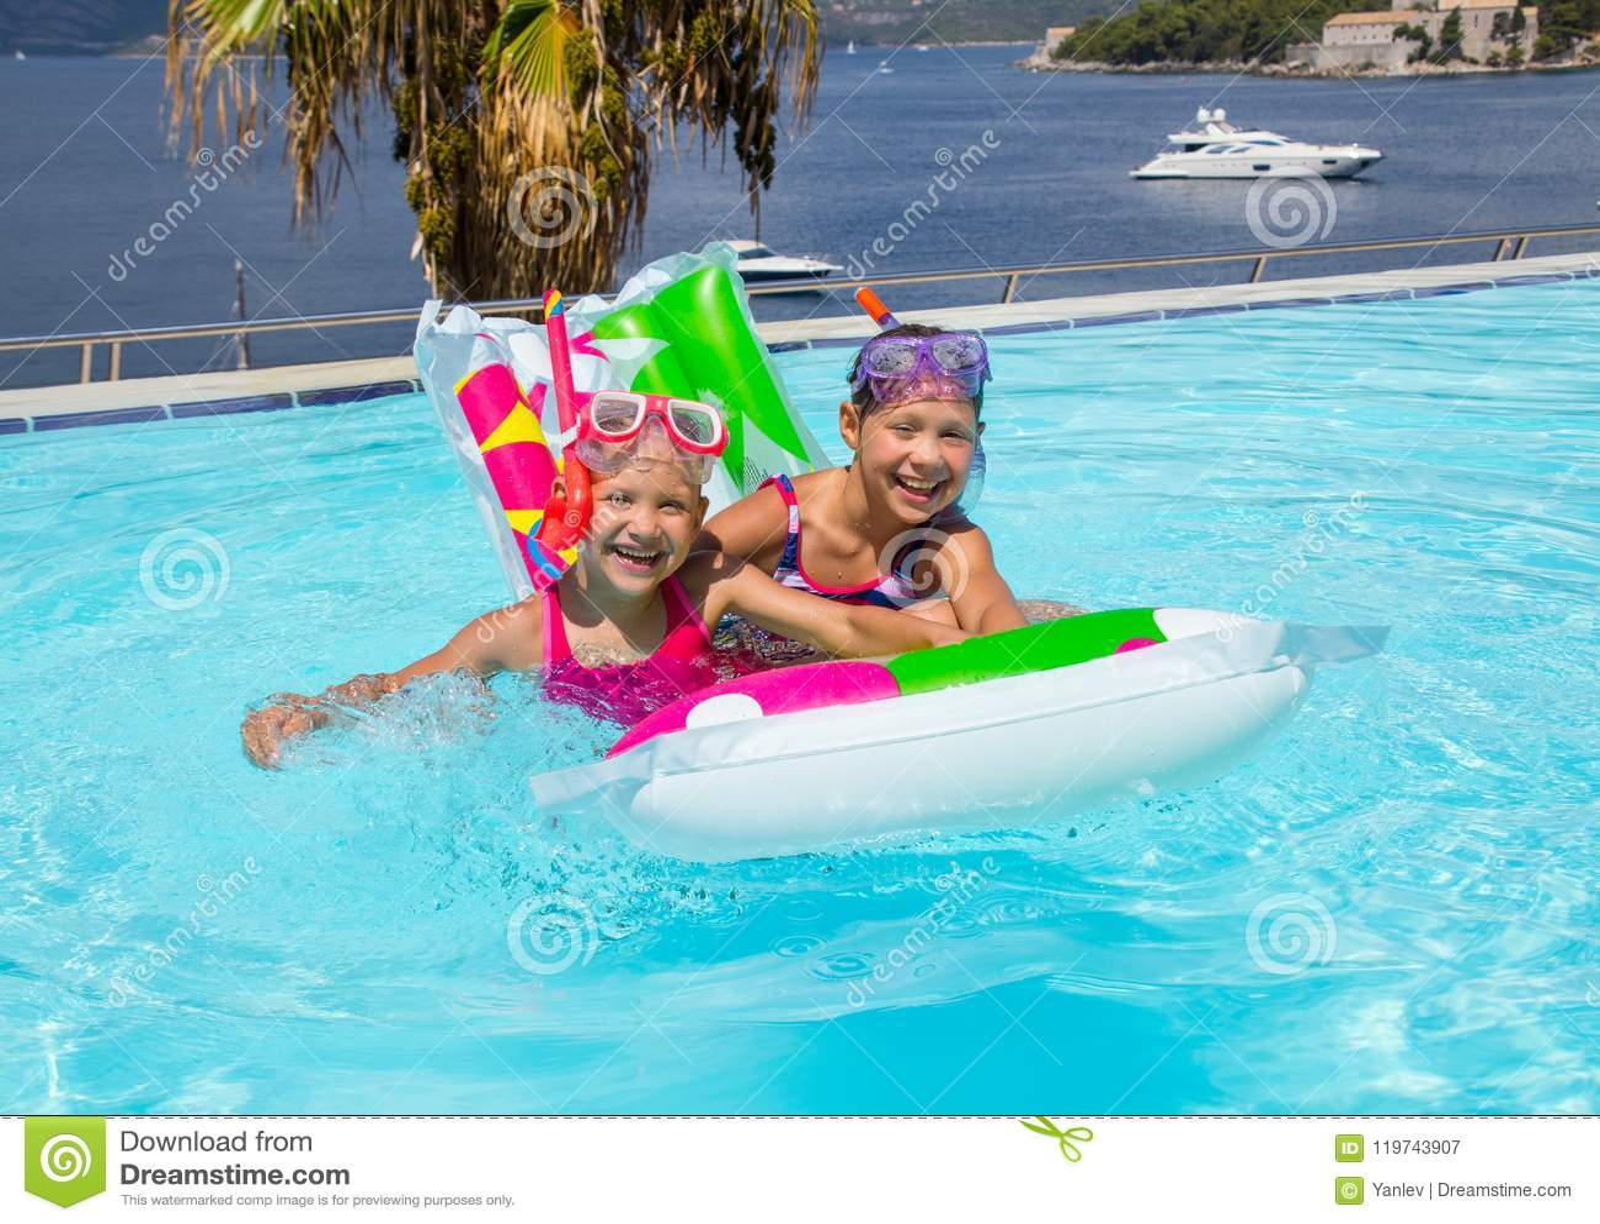 bb8751c815cf9a Meisjes Die In Pool Zwemmen Stock Afbeelding - Afbeelding bestaande ...